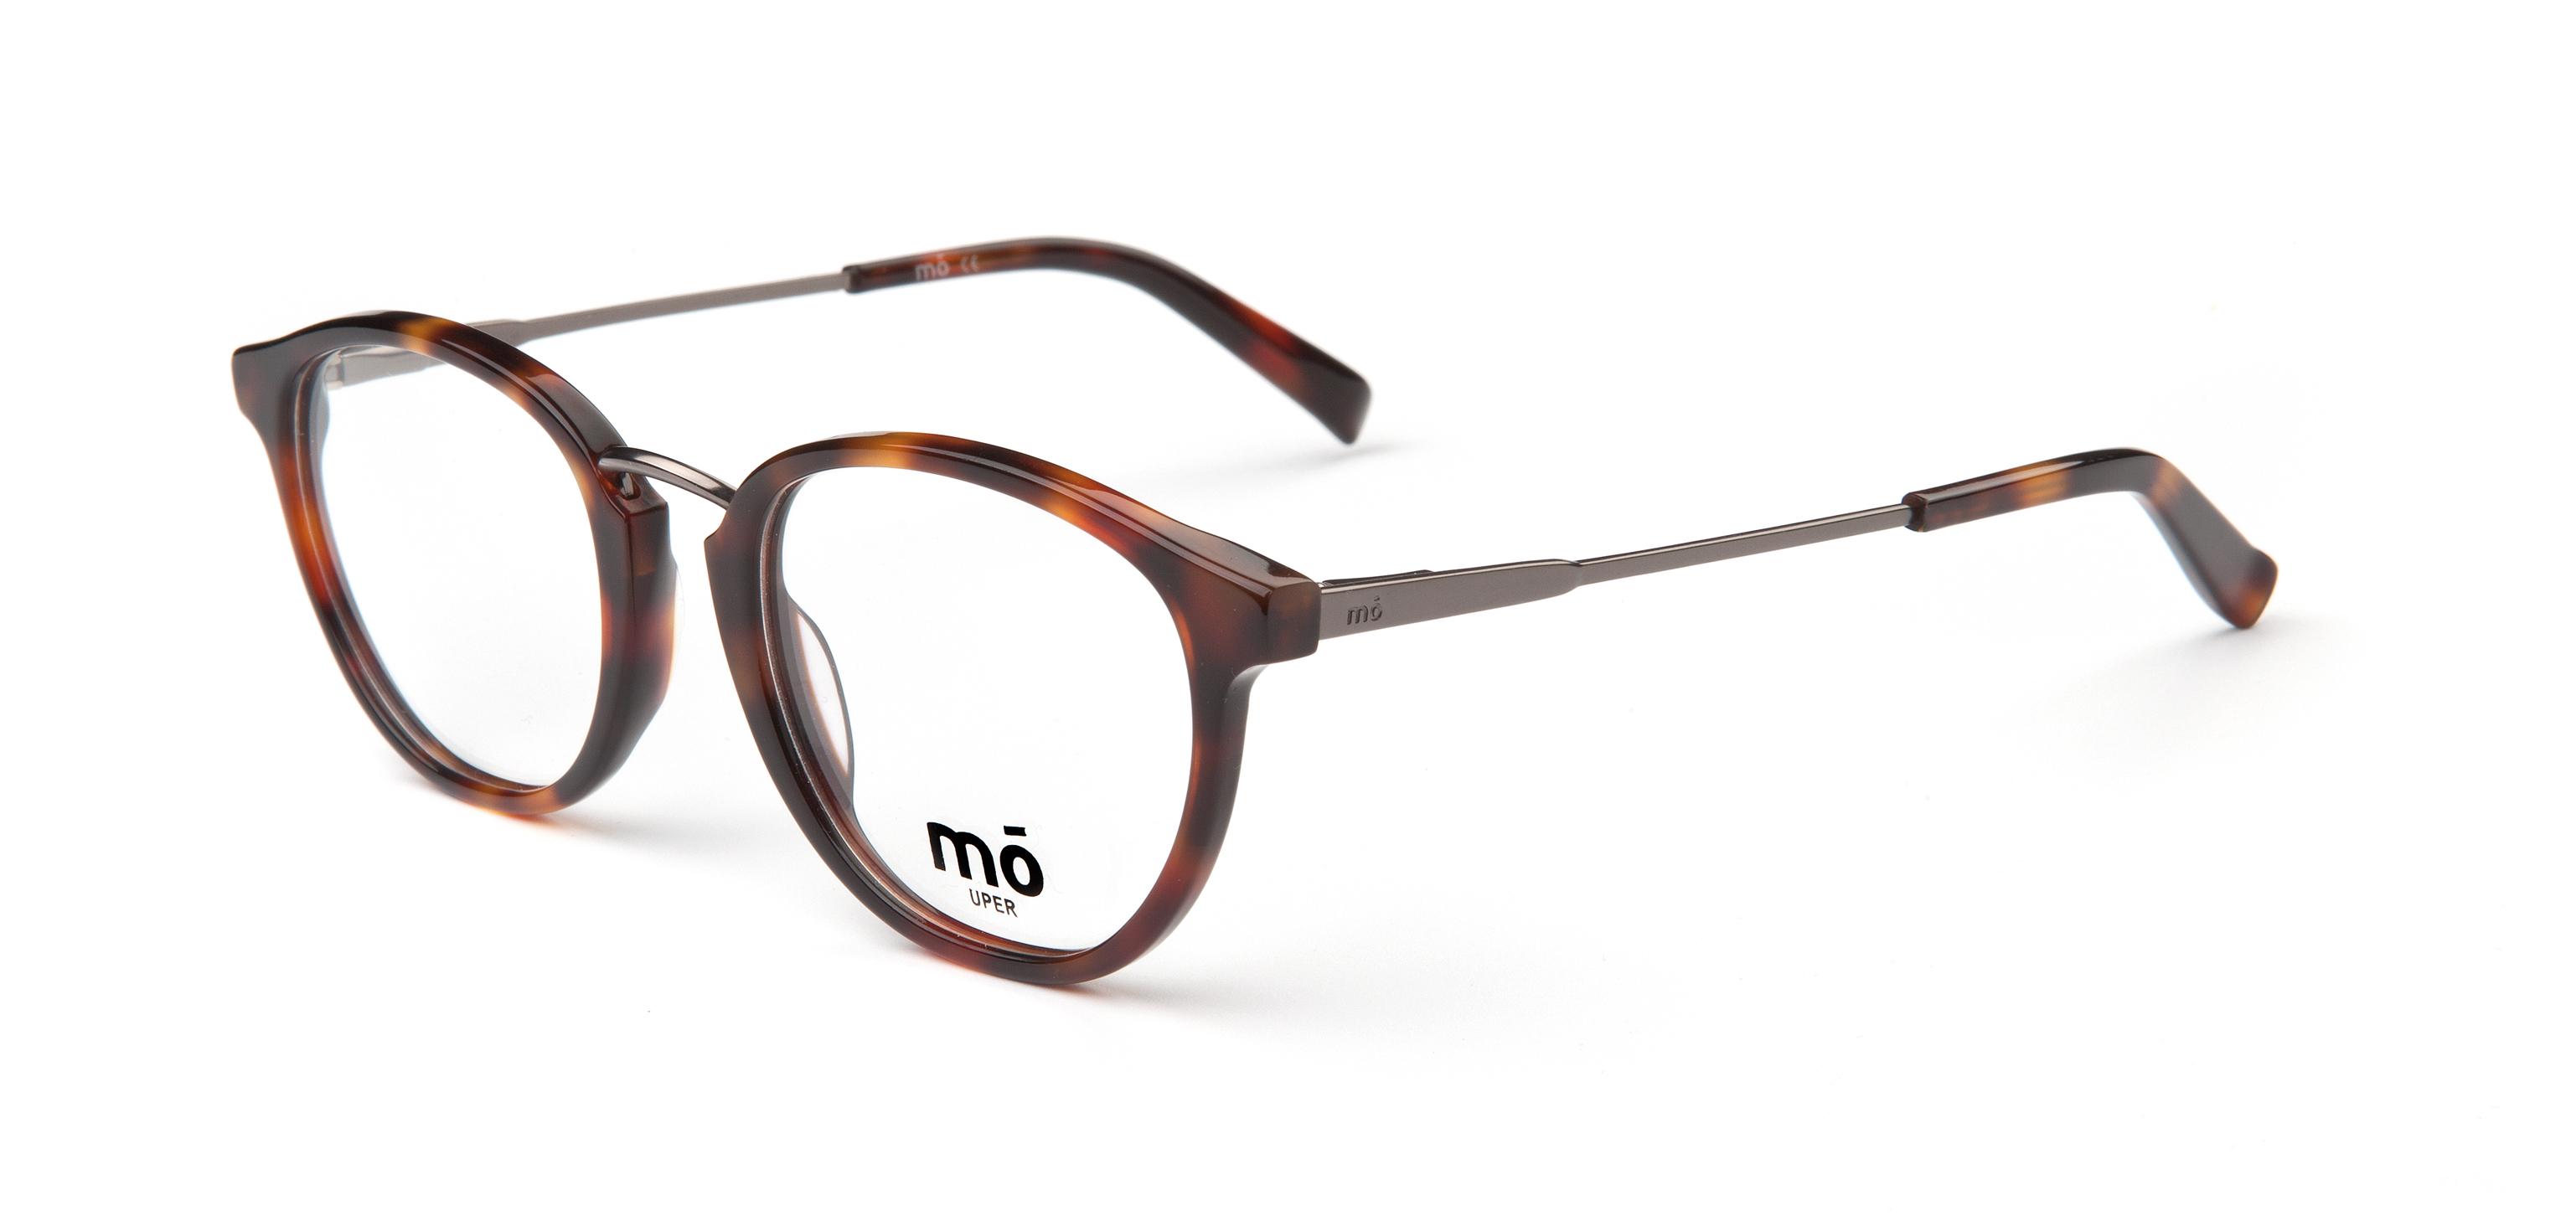 gafas de sol ray ban multiopticas